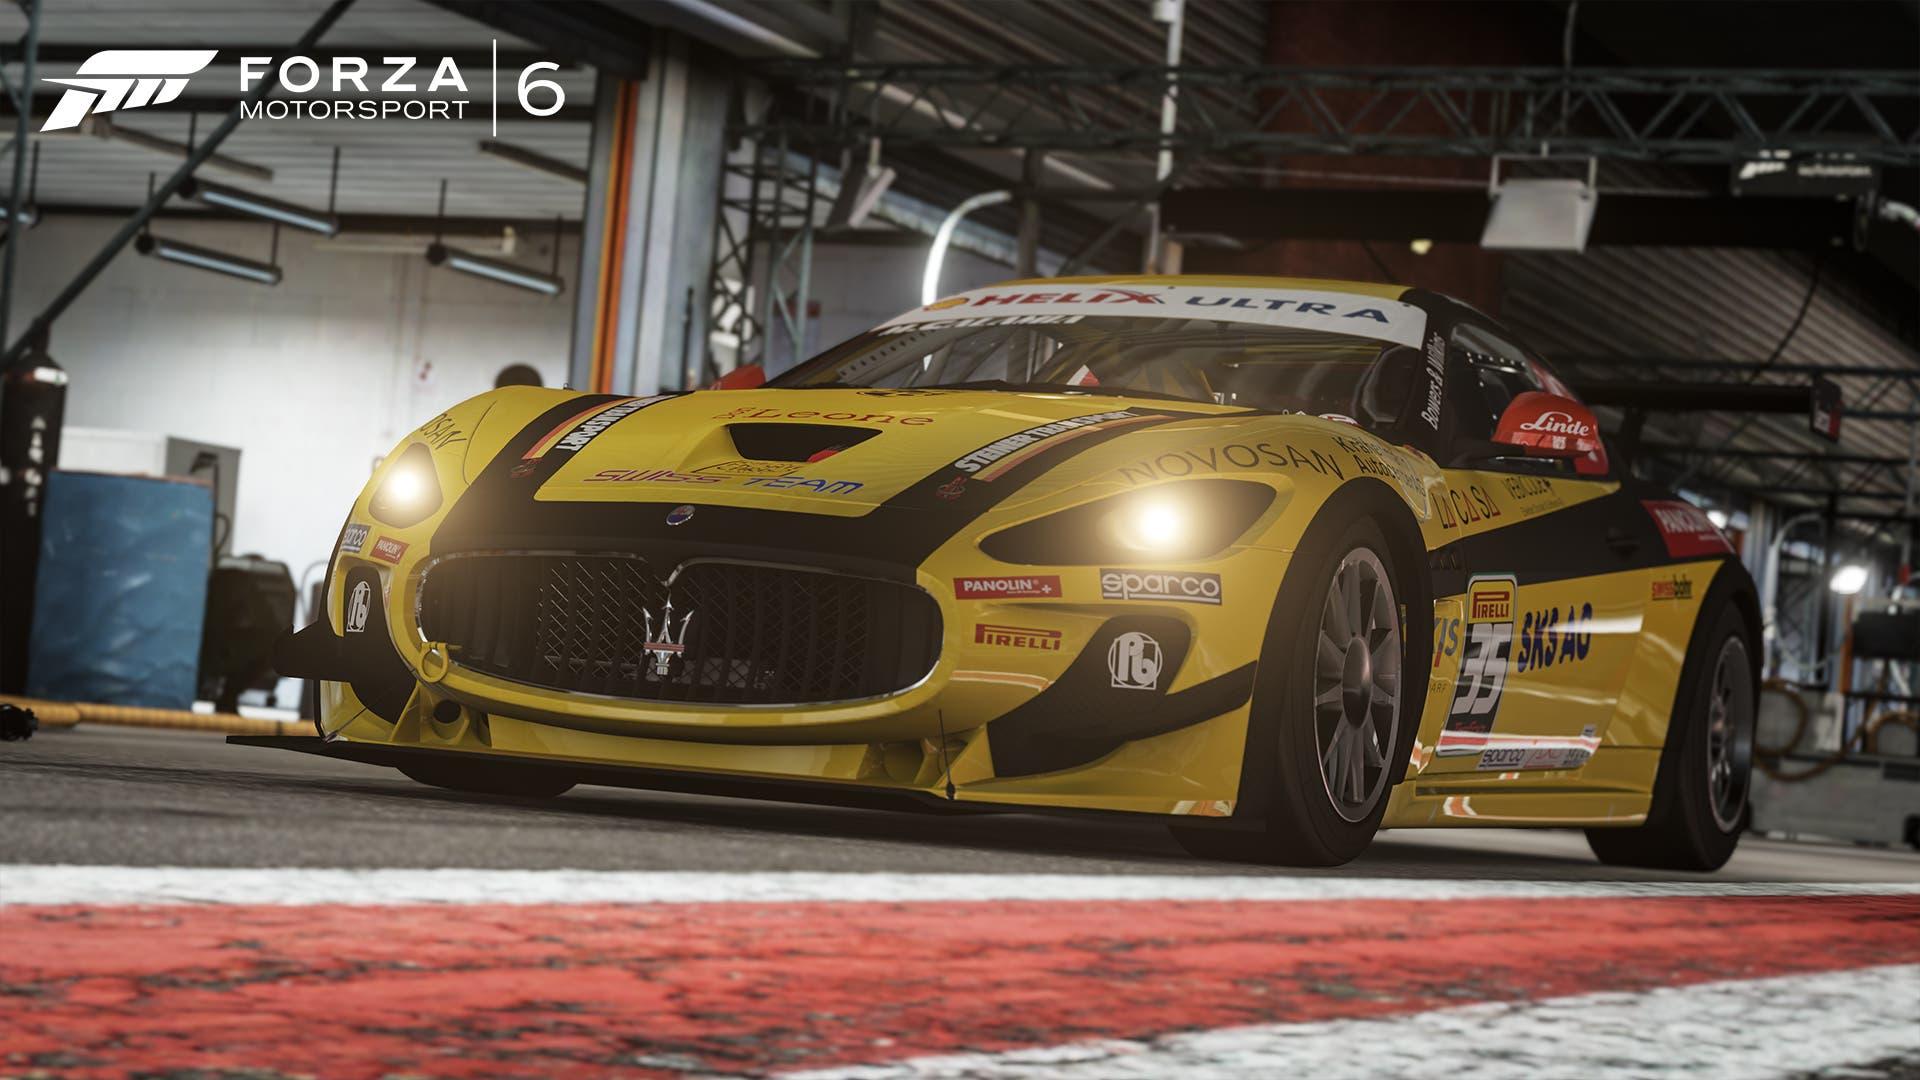 NovDLC_Maserati35SwissTeam_Forza6_WM